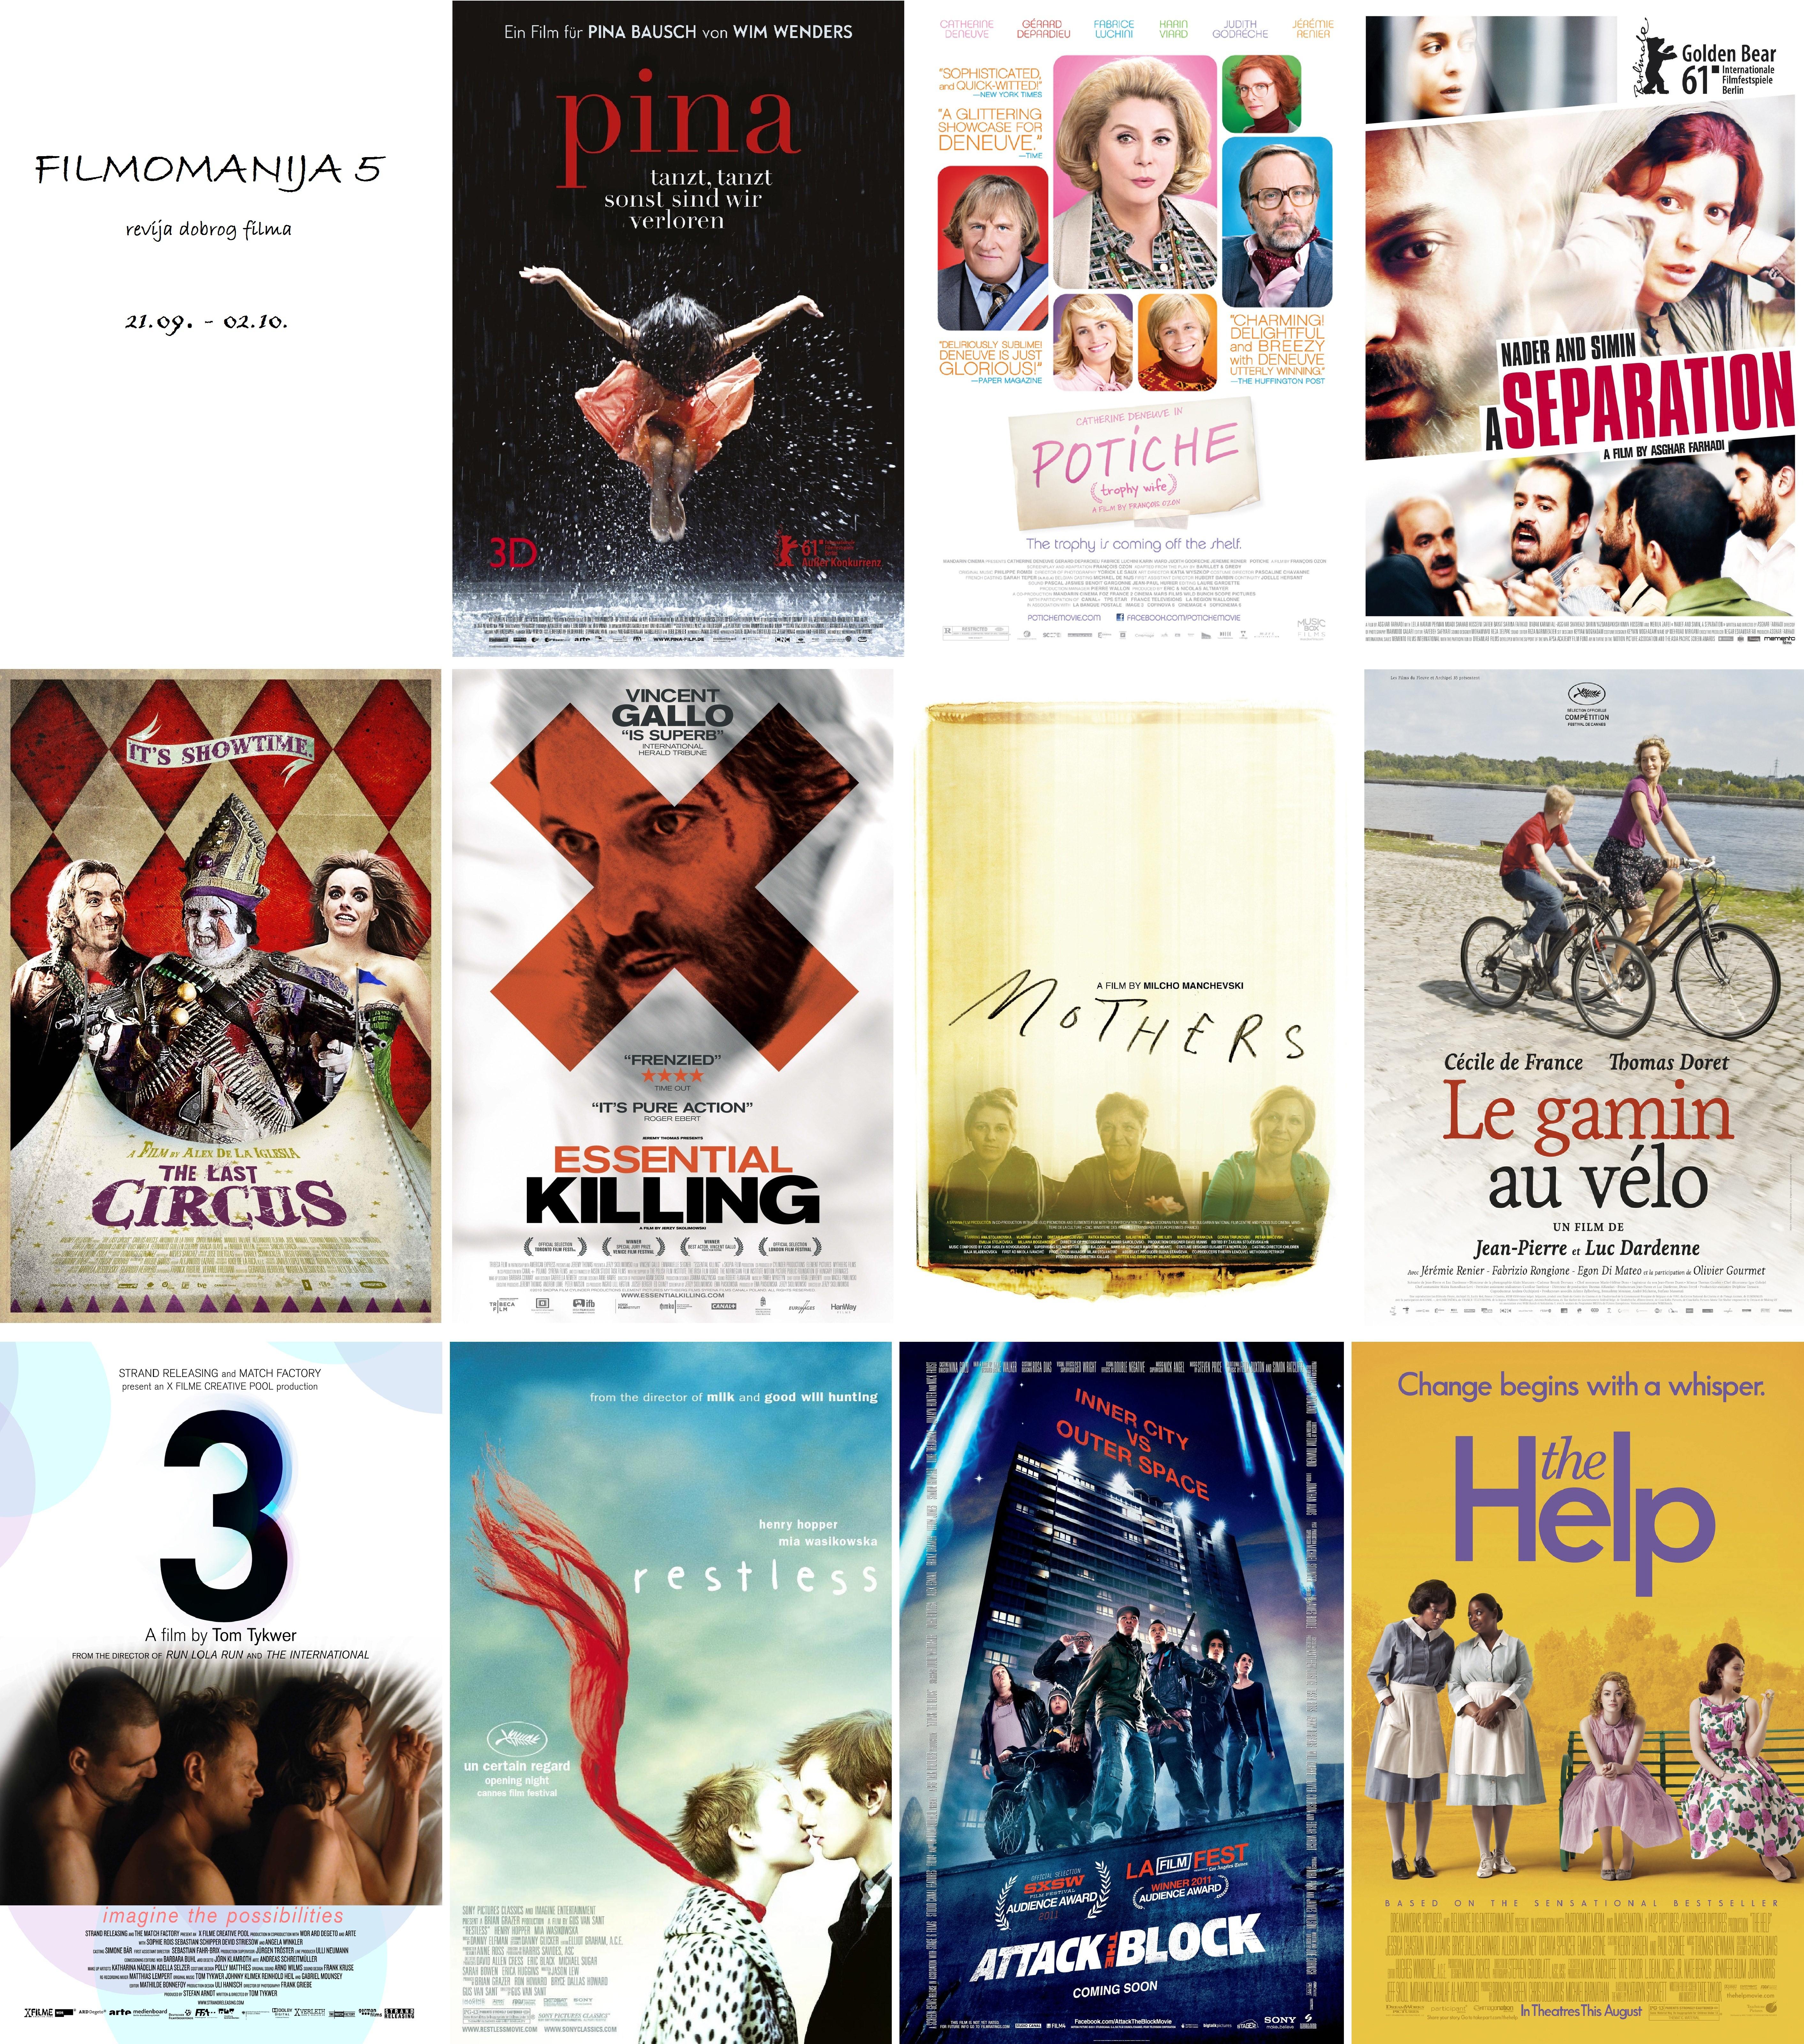 Filmomanija 5